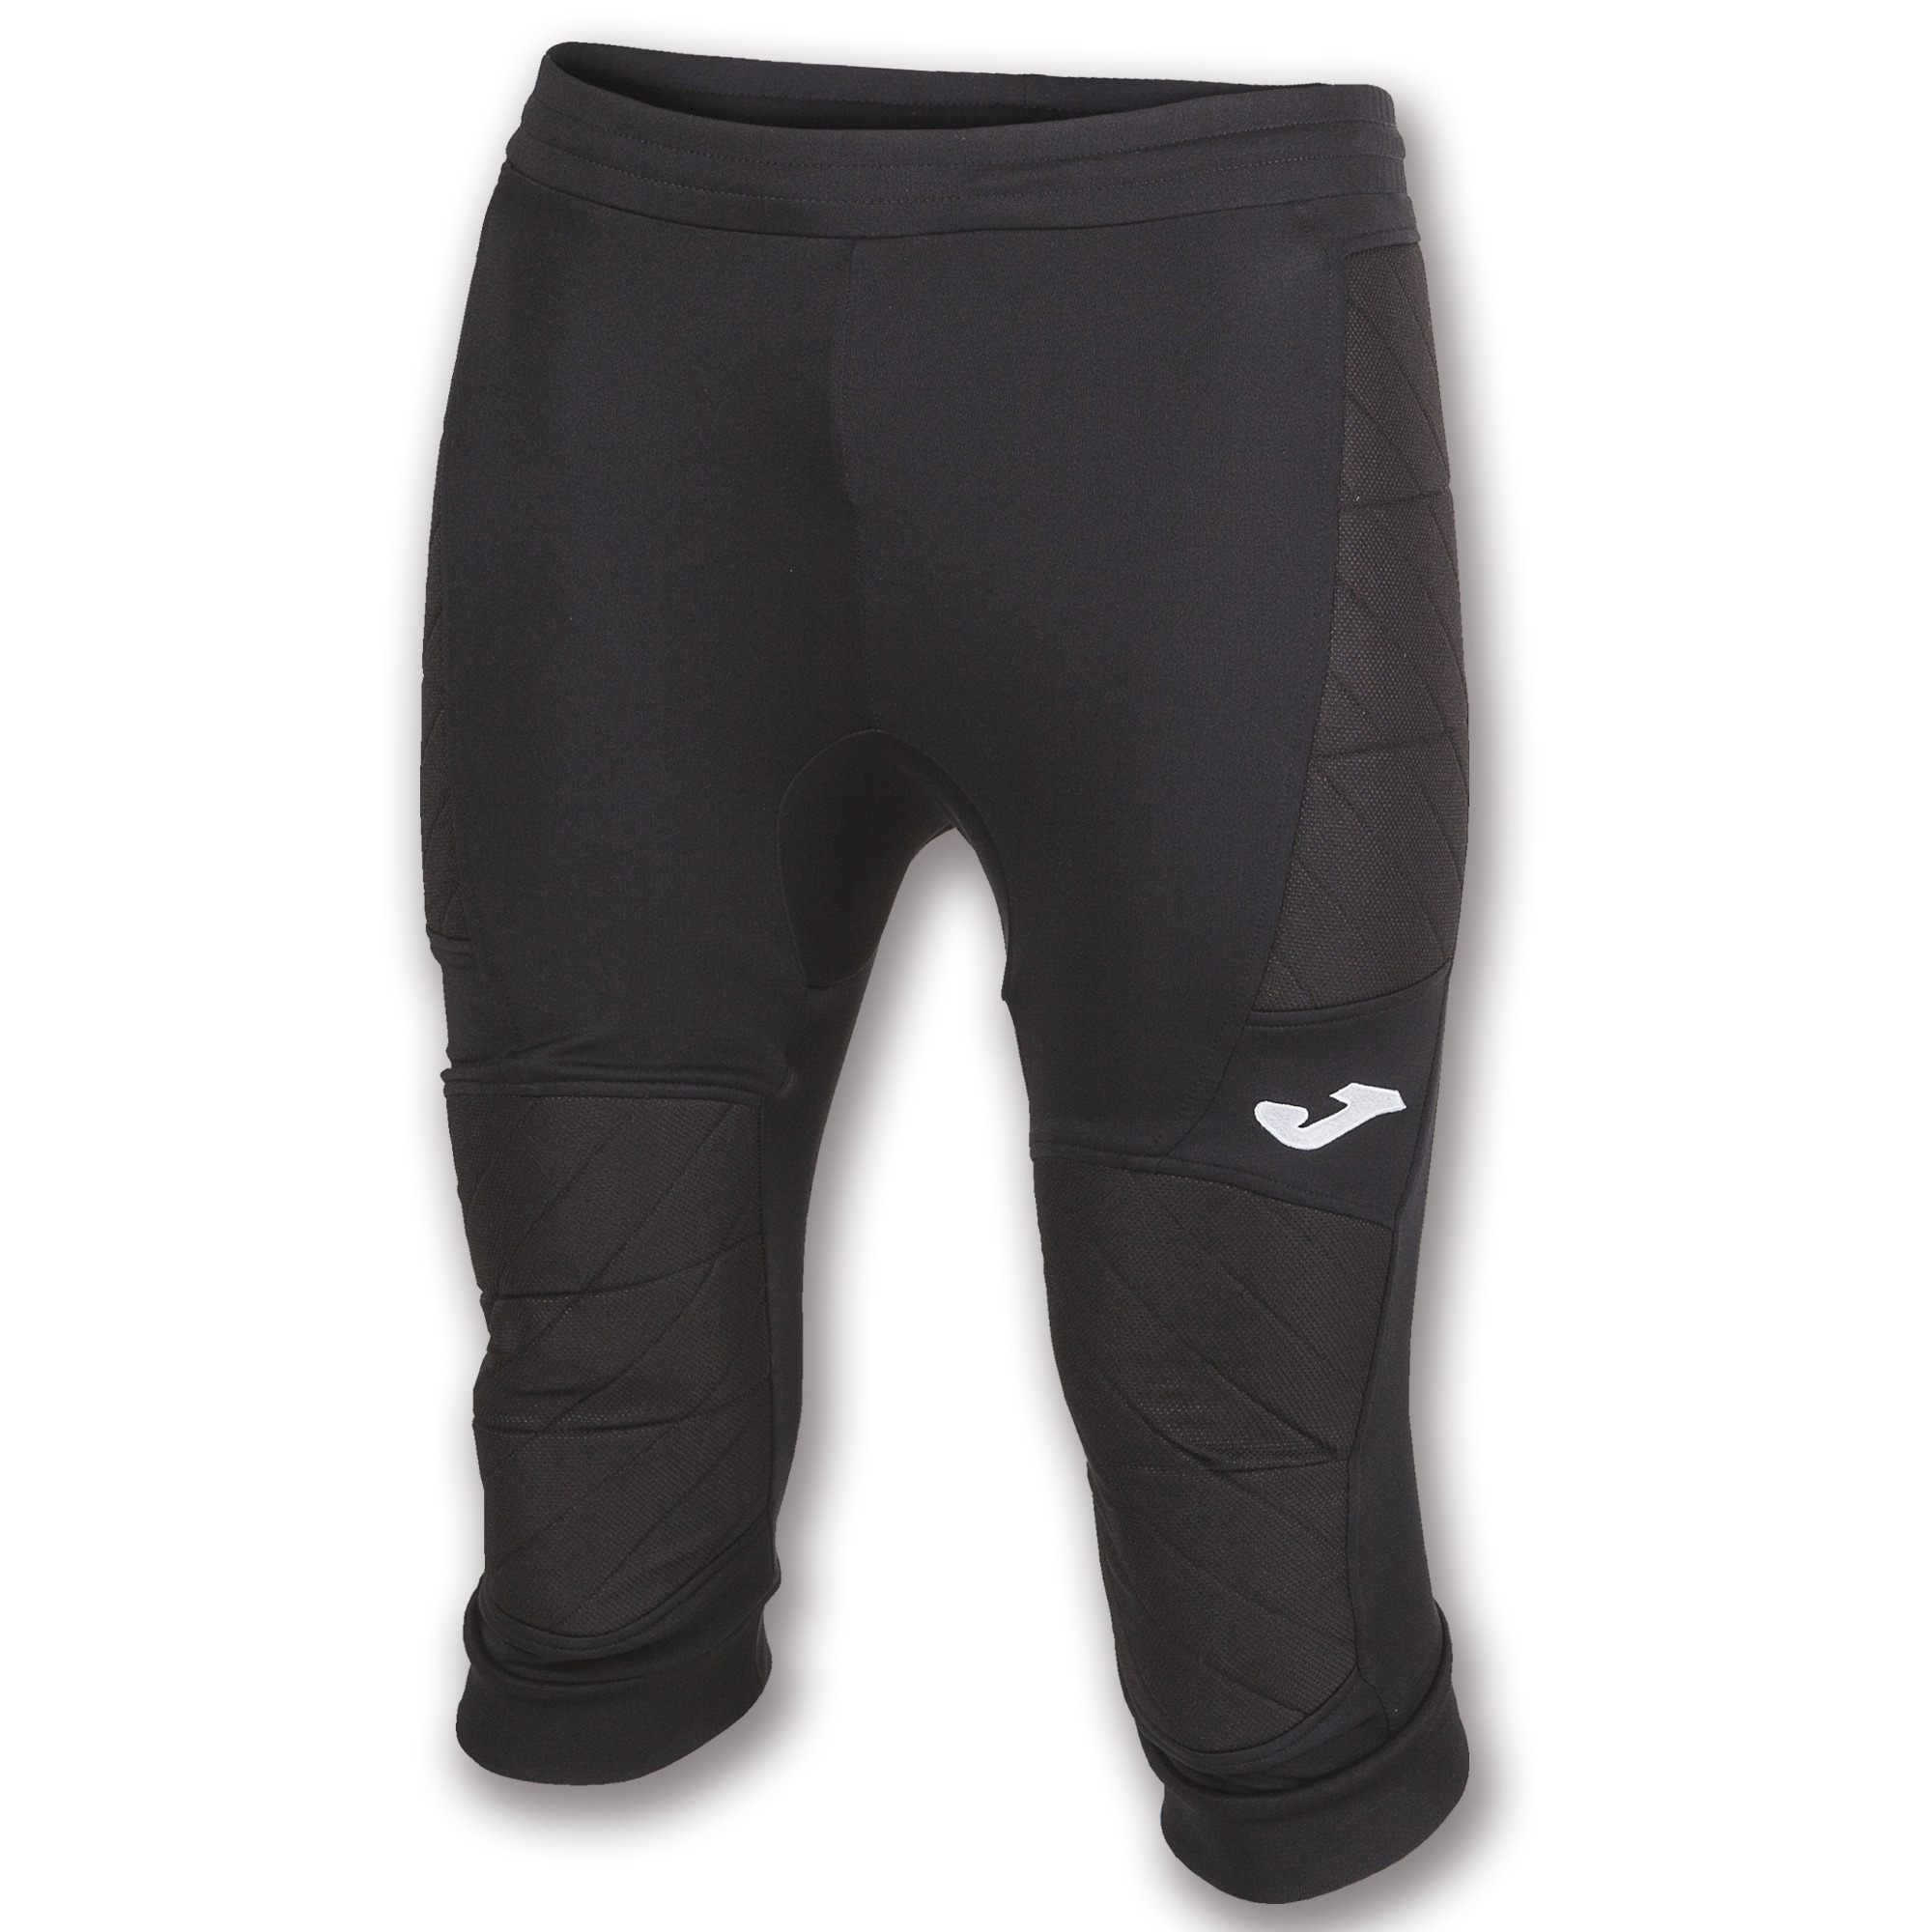 Joma Protec Color Negro Pantal/ón de Portero para Hombre